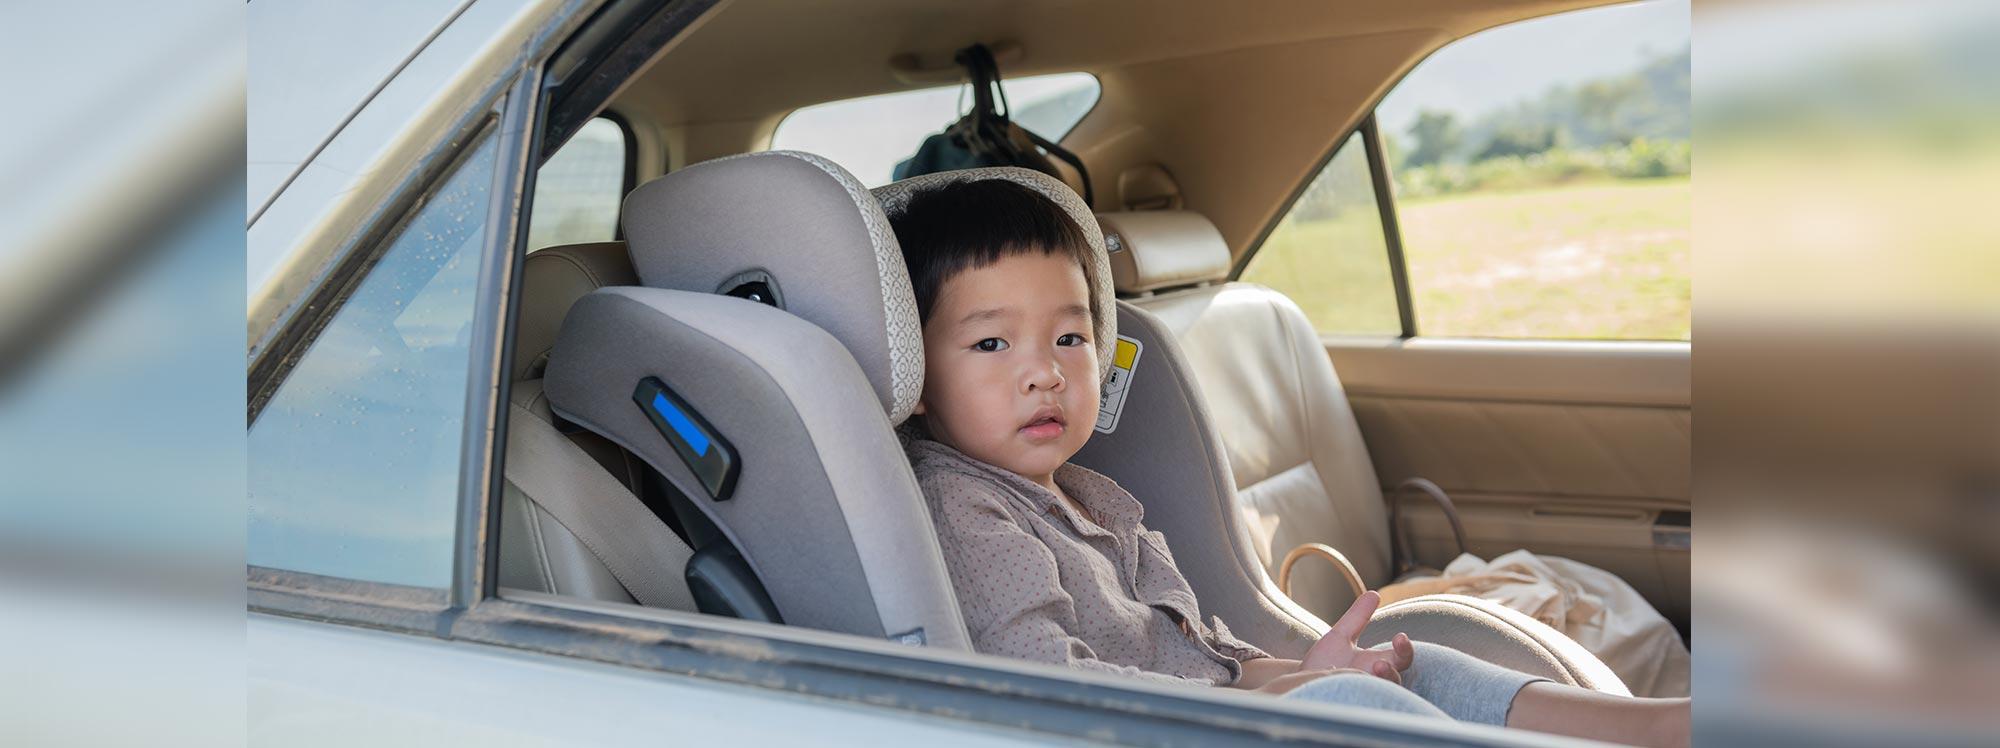 Golpe de calor en autos, peligro de muerte